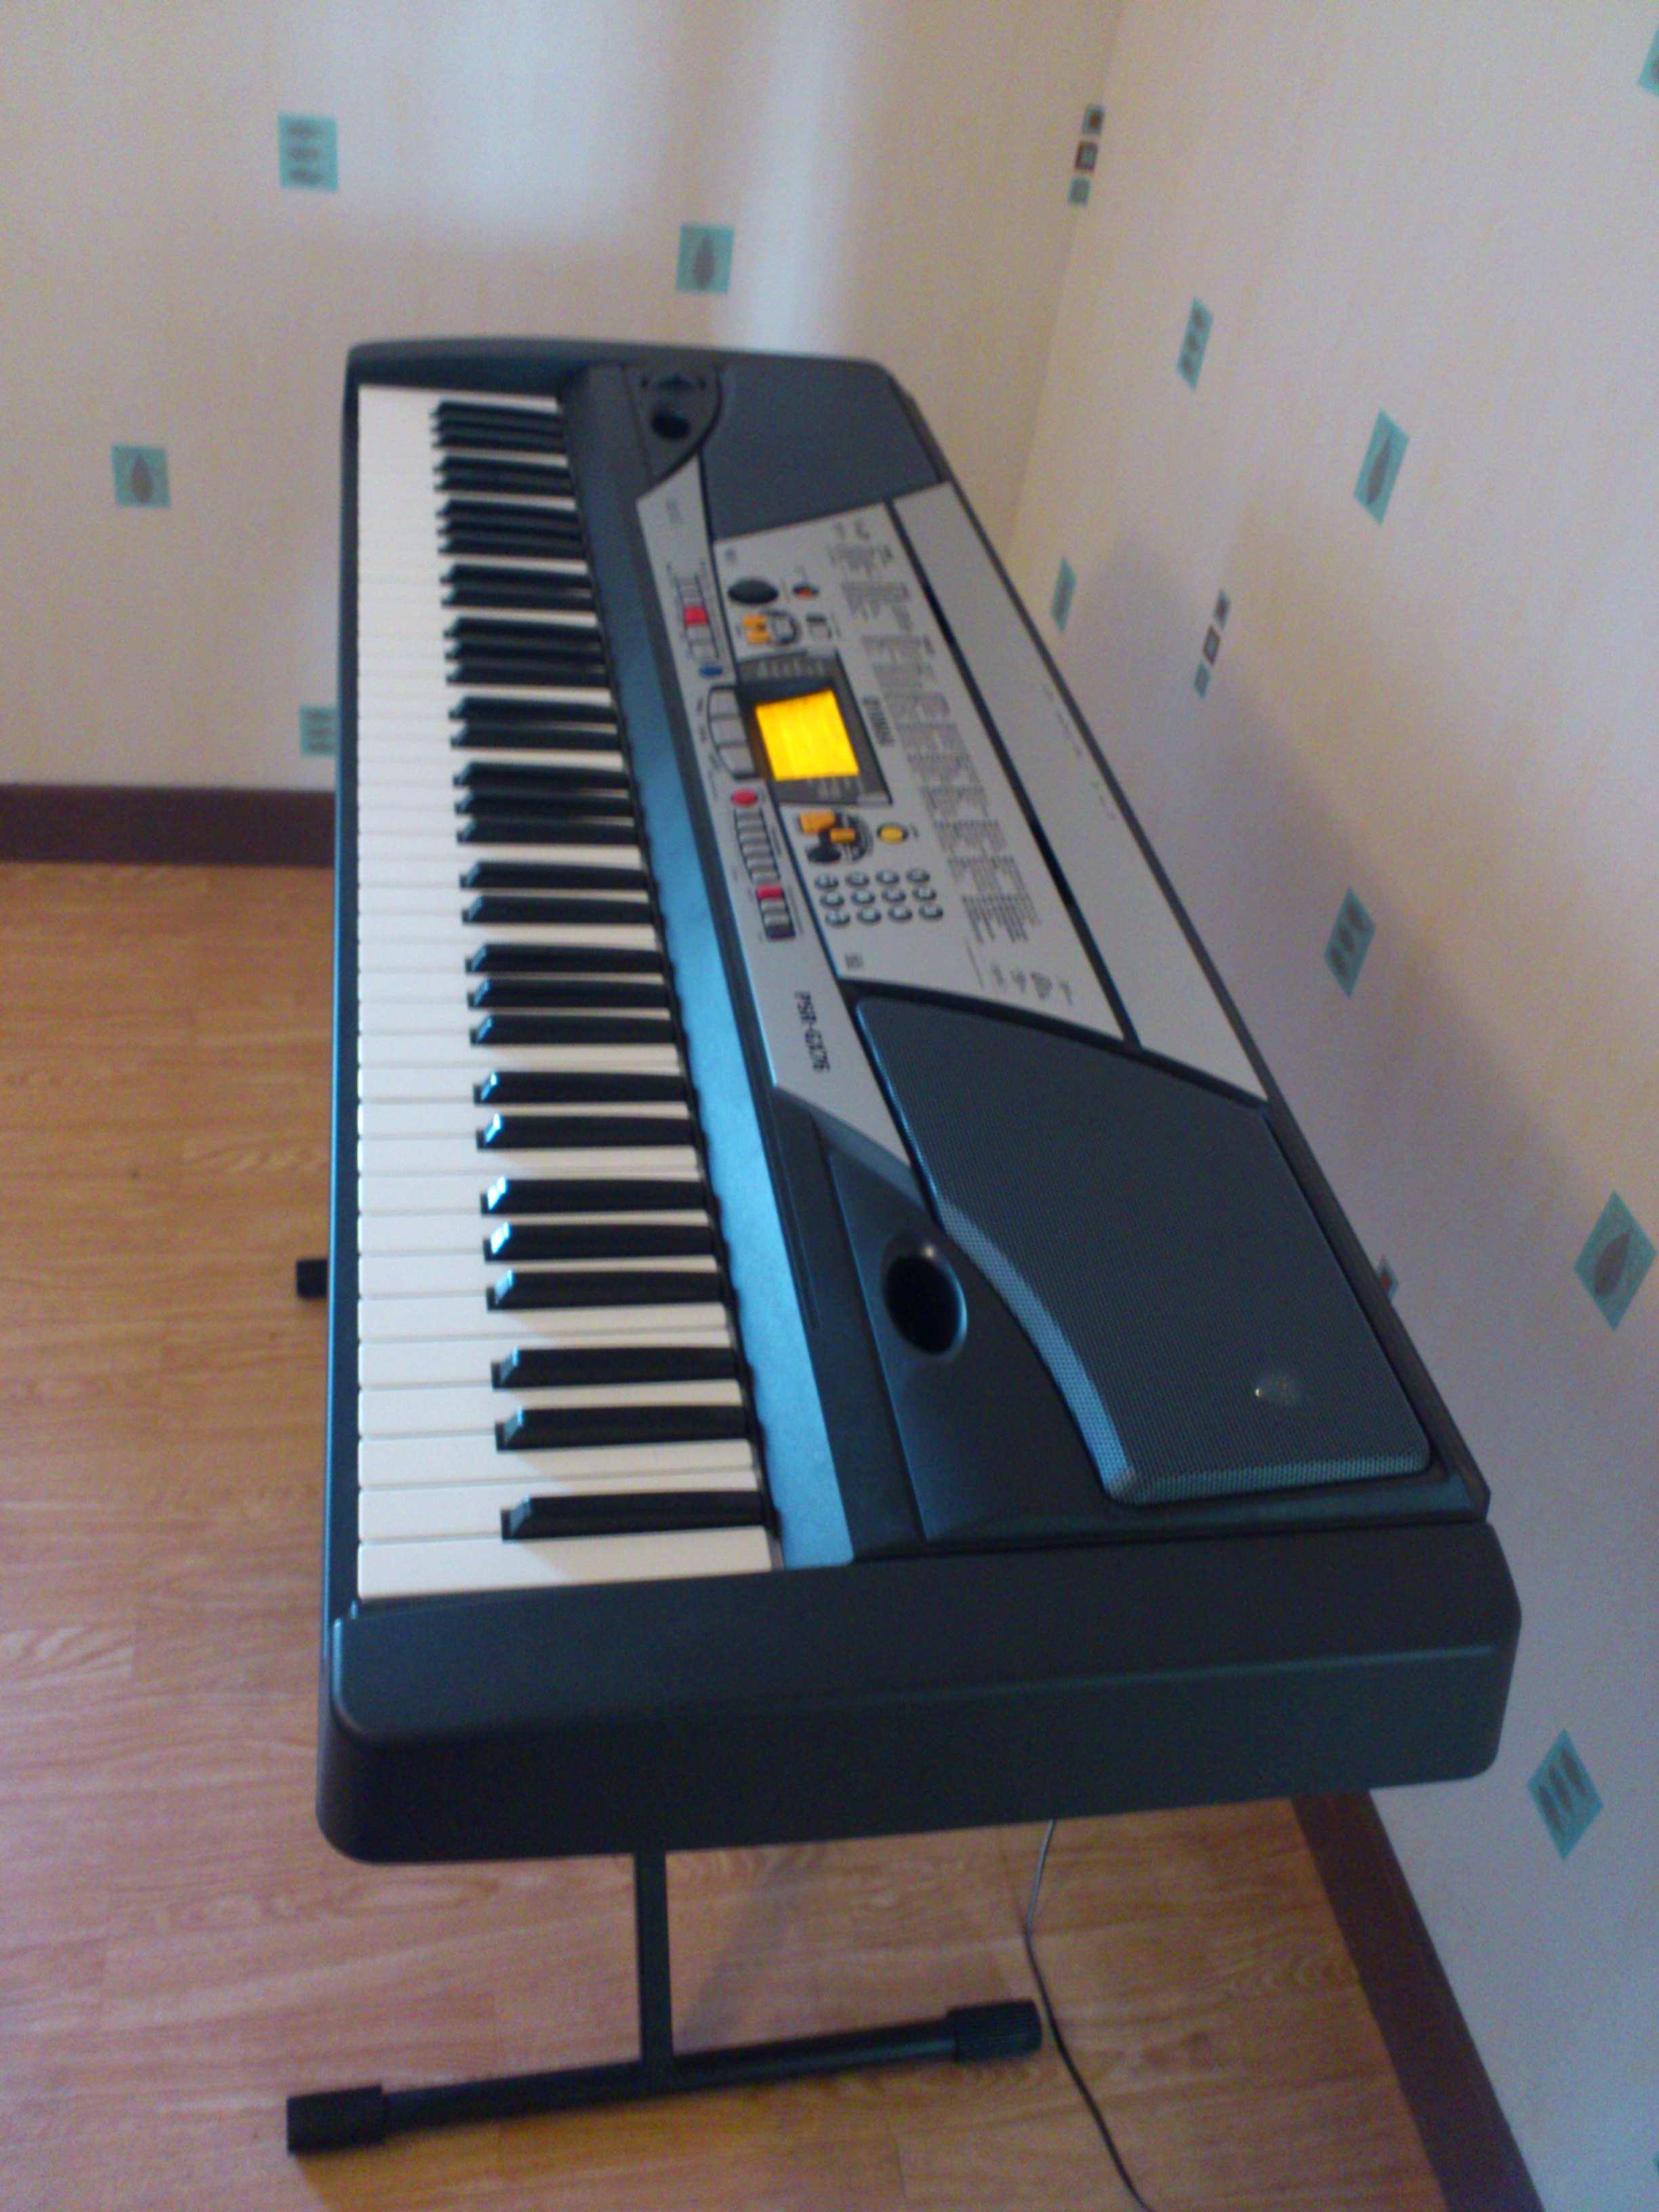 yamaha psr gx76 image 552499 audiofanzine rh en audiofanzine com Yamaha PSR Series yamaha psr gx76 service manual